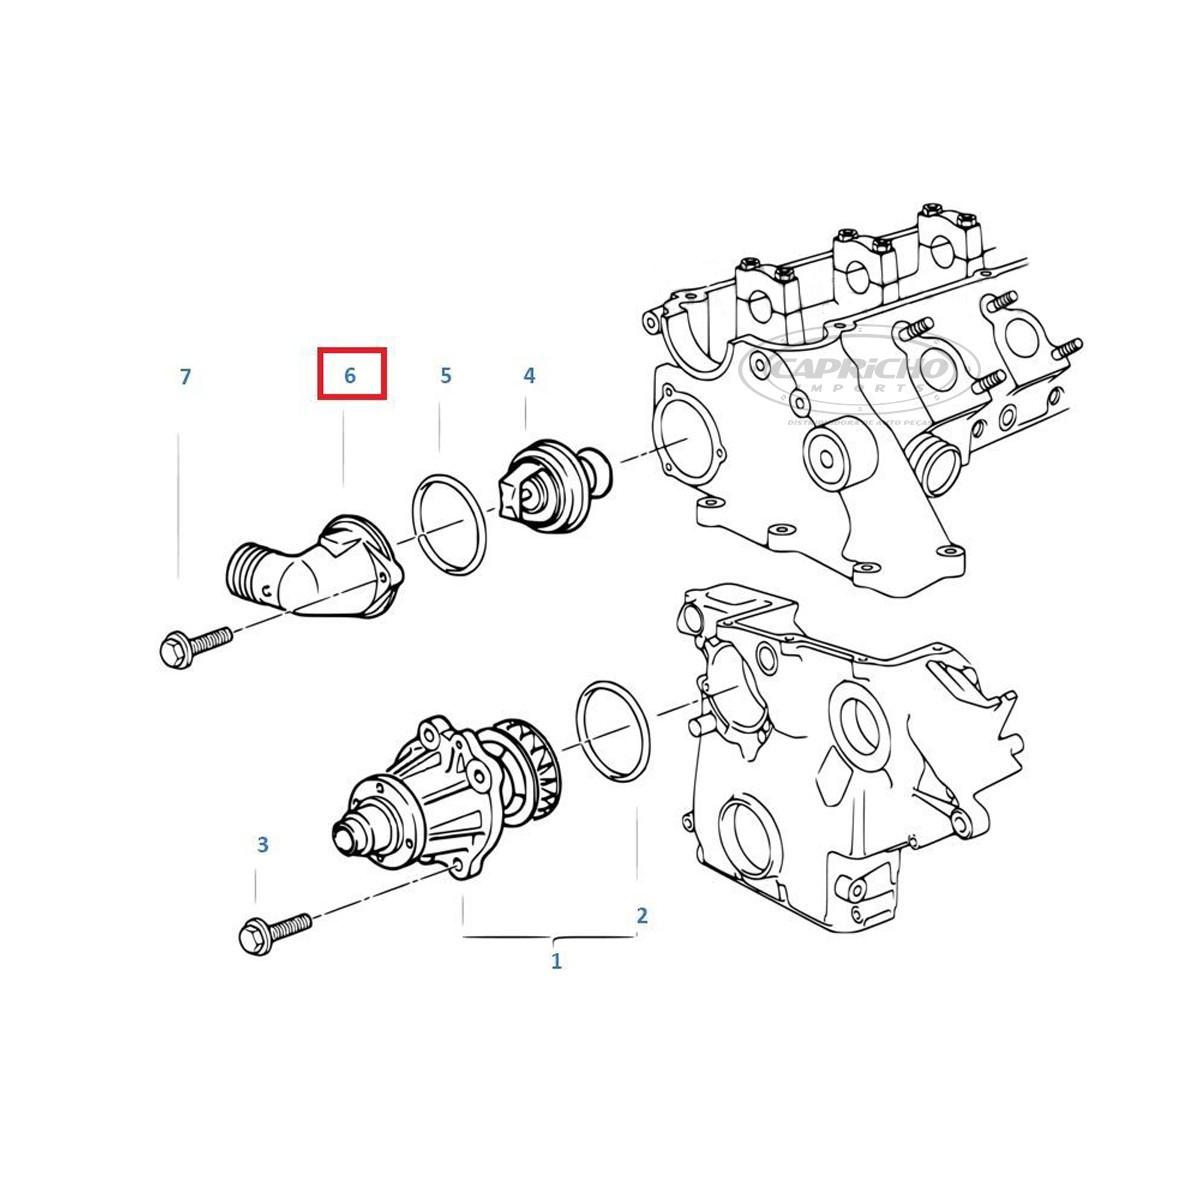 Conector / Flange Válvula Termostática BMW E36 318 325 525 725 TODAS - 1991 / 2000